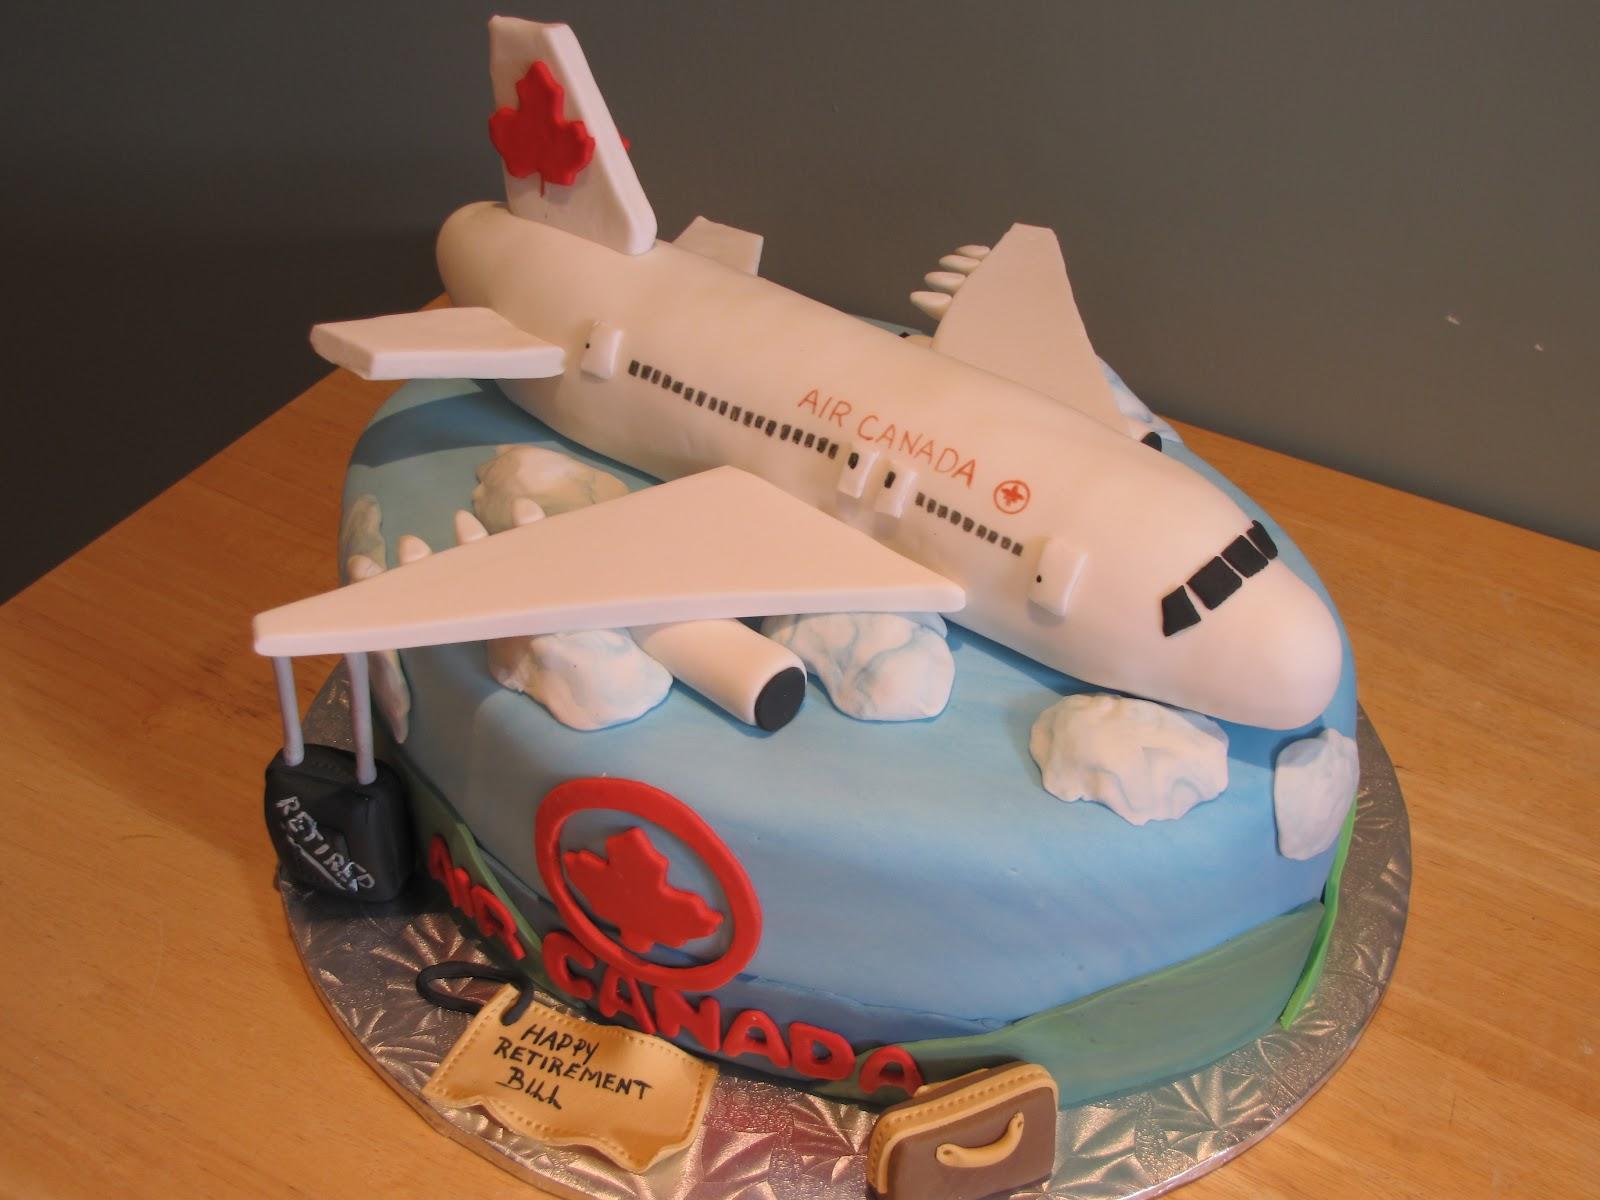 Ann marie 39 s creative cakes air canada 330 airplane for Airplane cake decoration